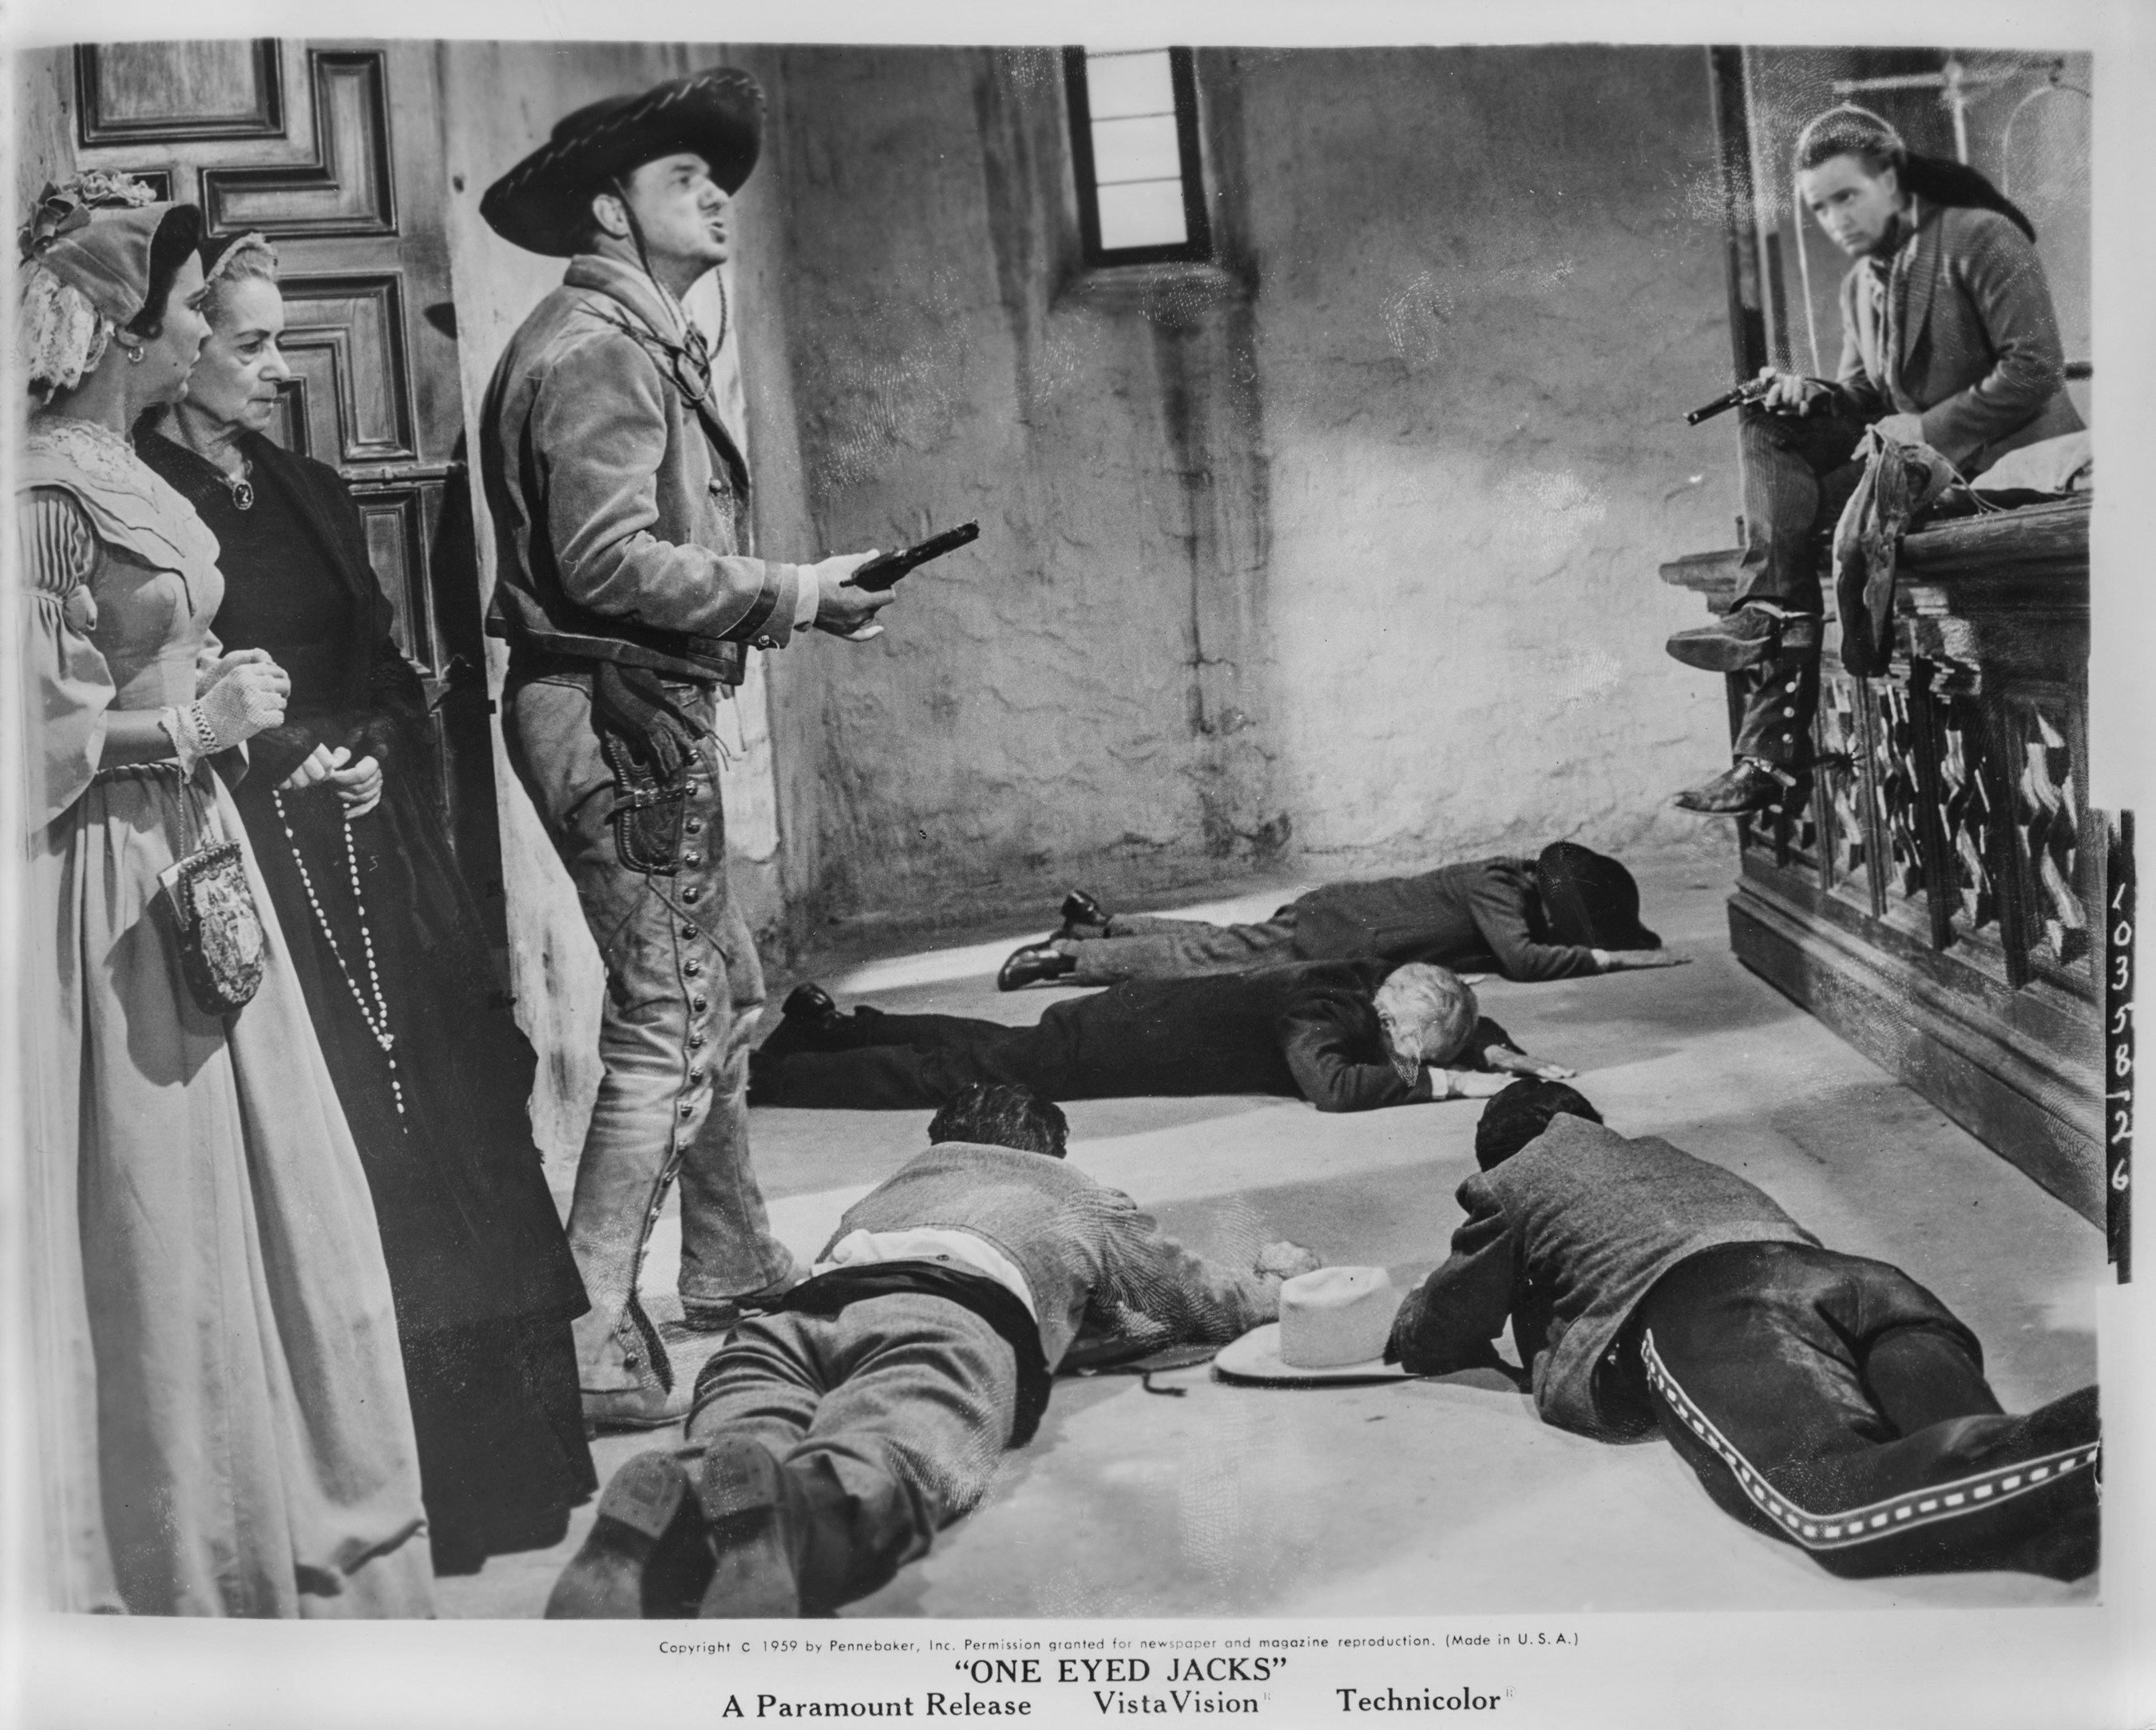 Karl Malden and Marlon Brando stand-off in One-Eyed Jacks.